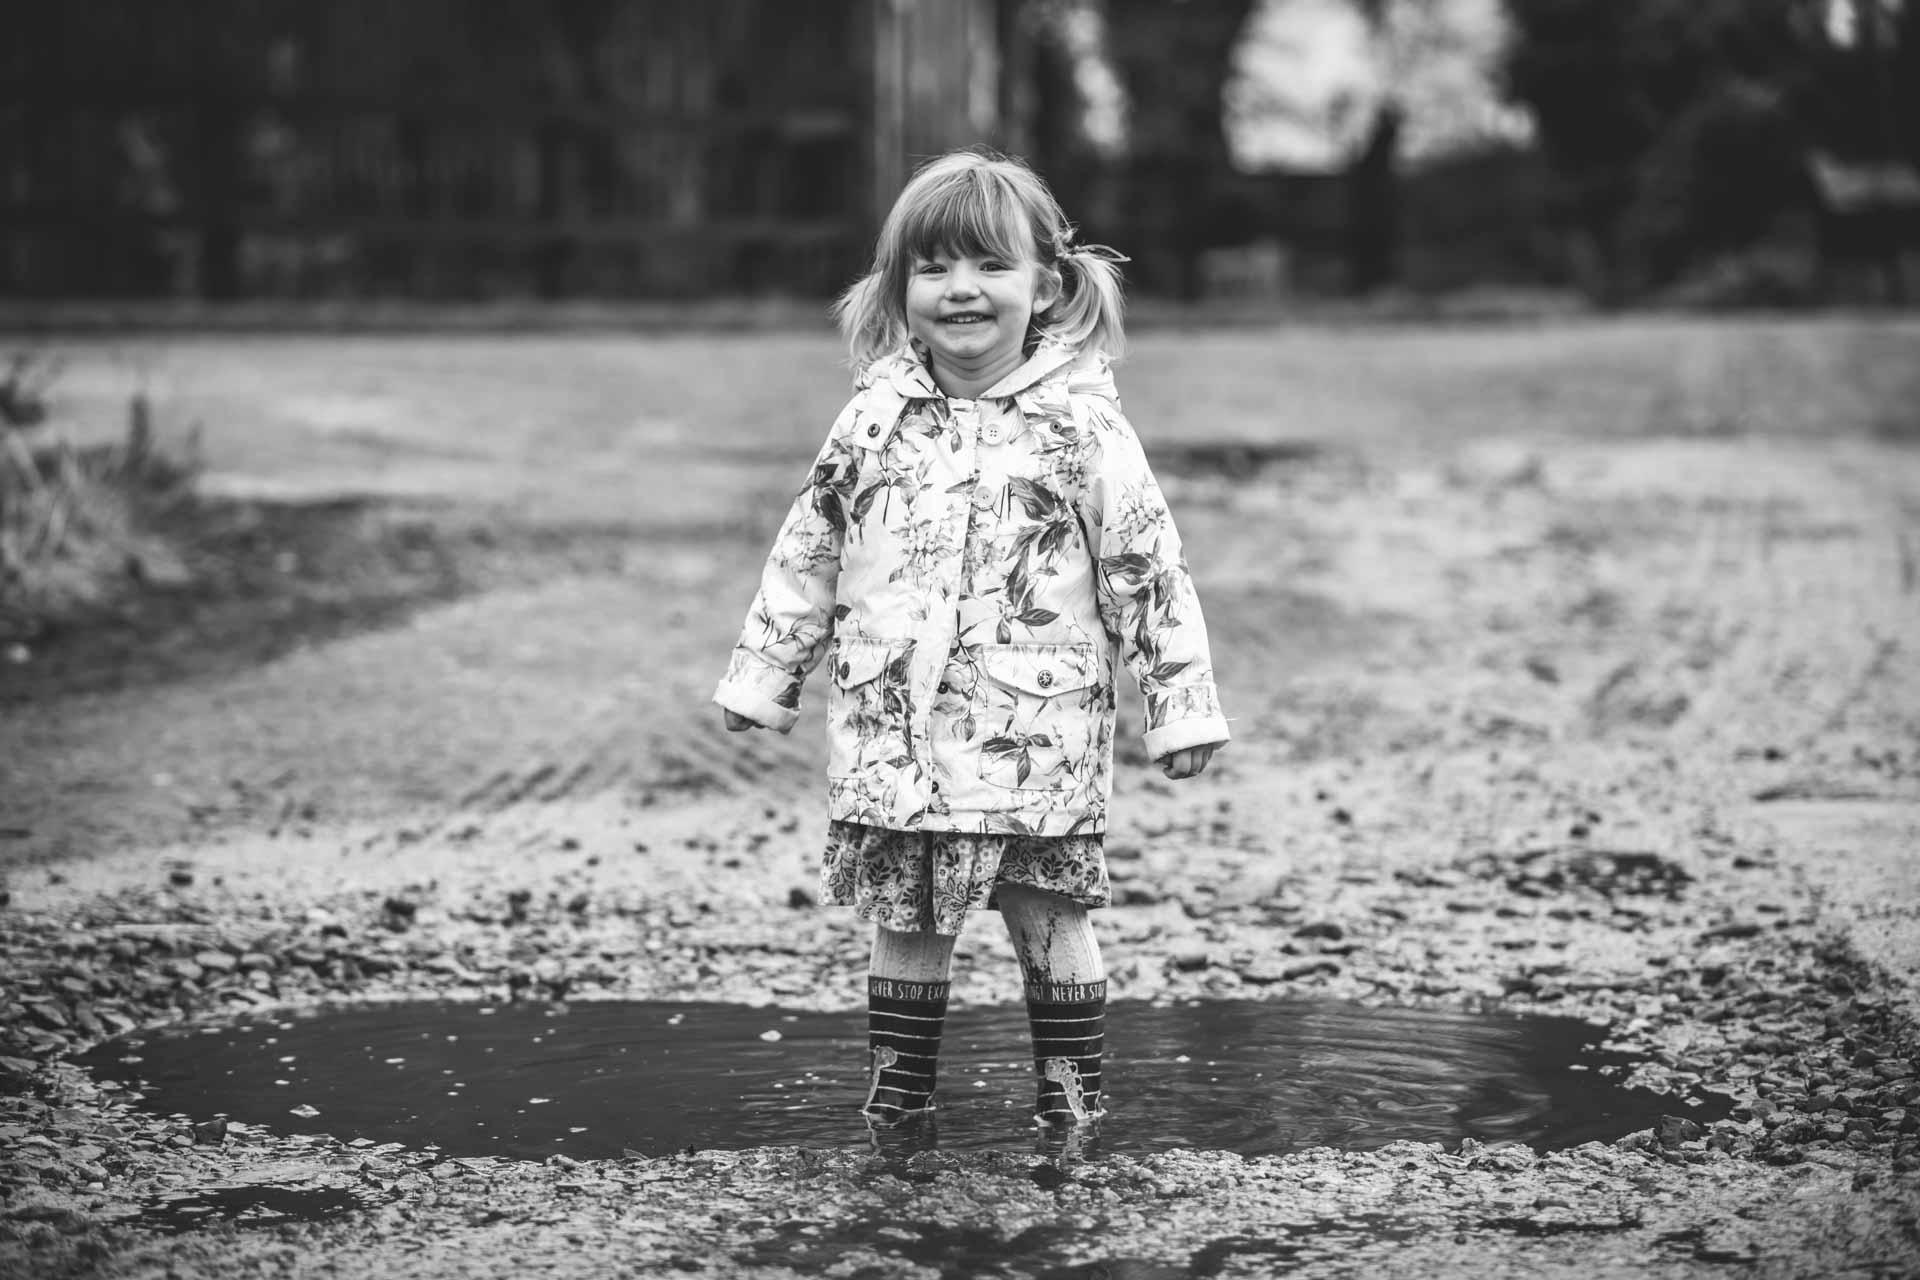 Jump in muddy puddles Joanna Eardley Photography